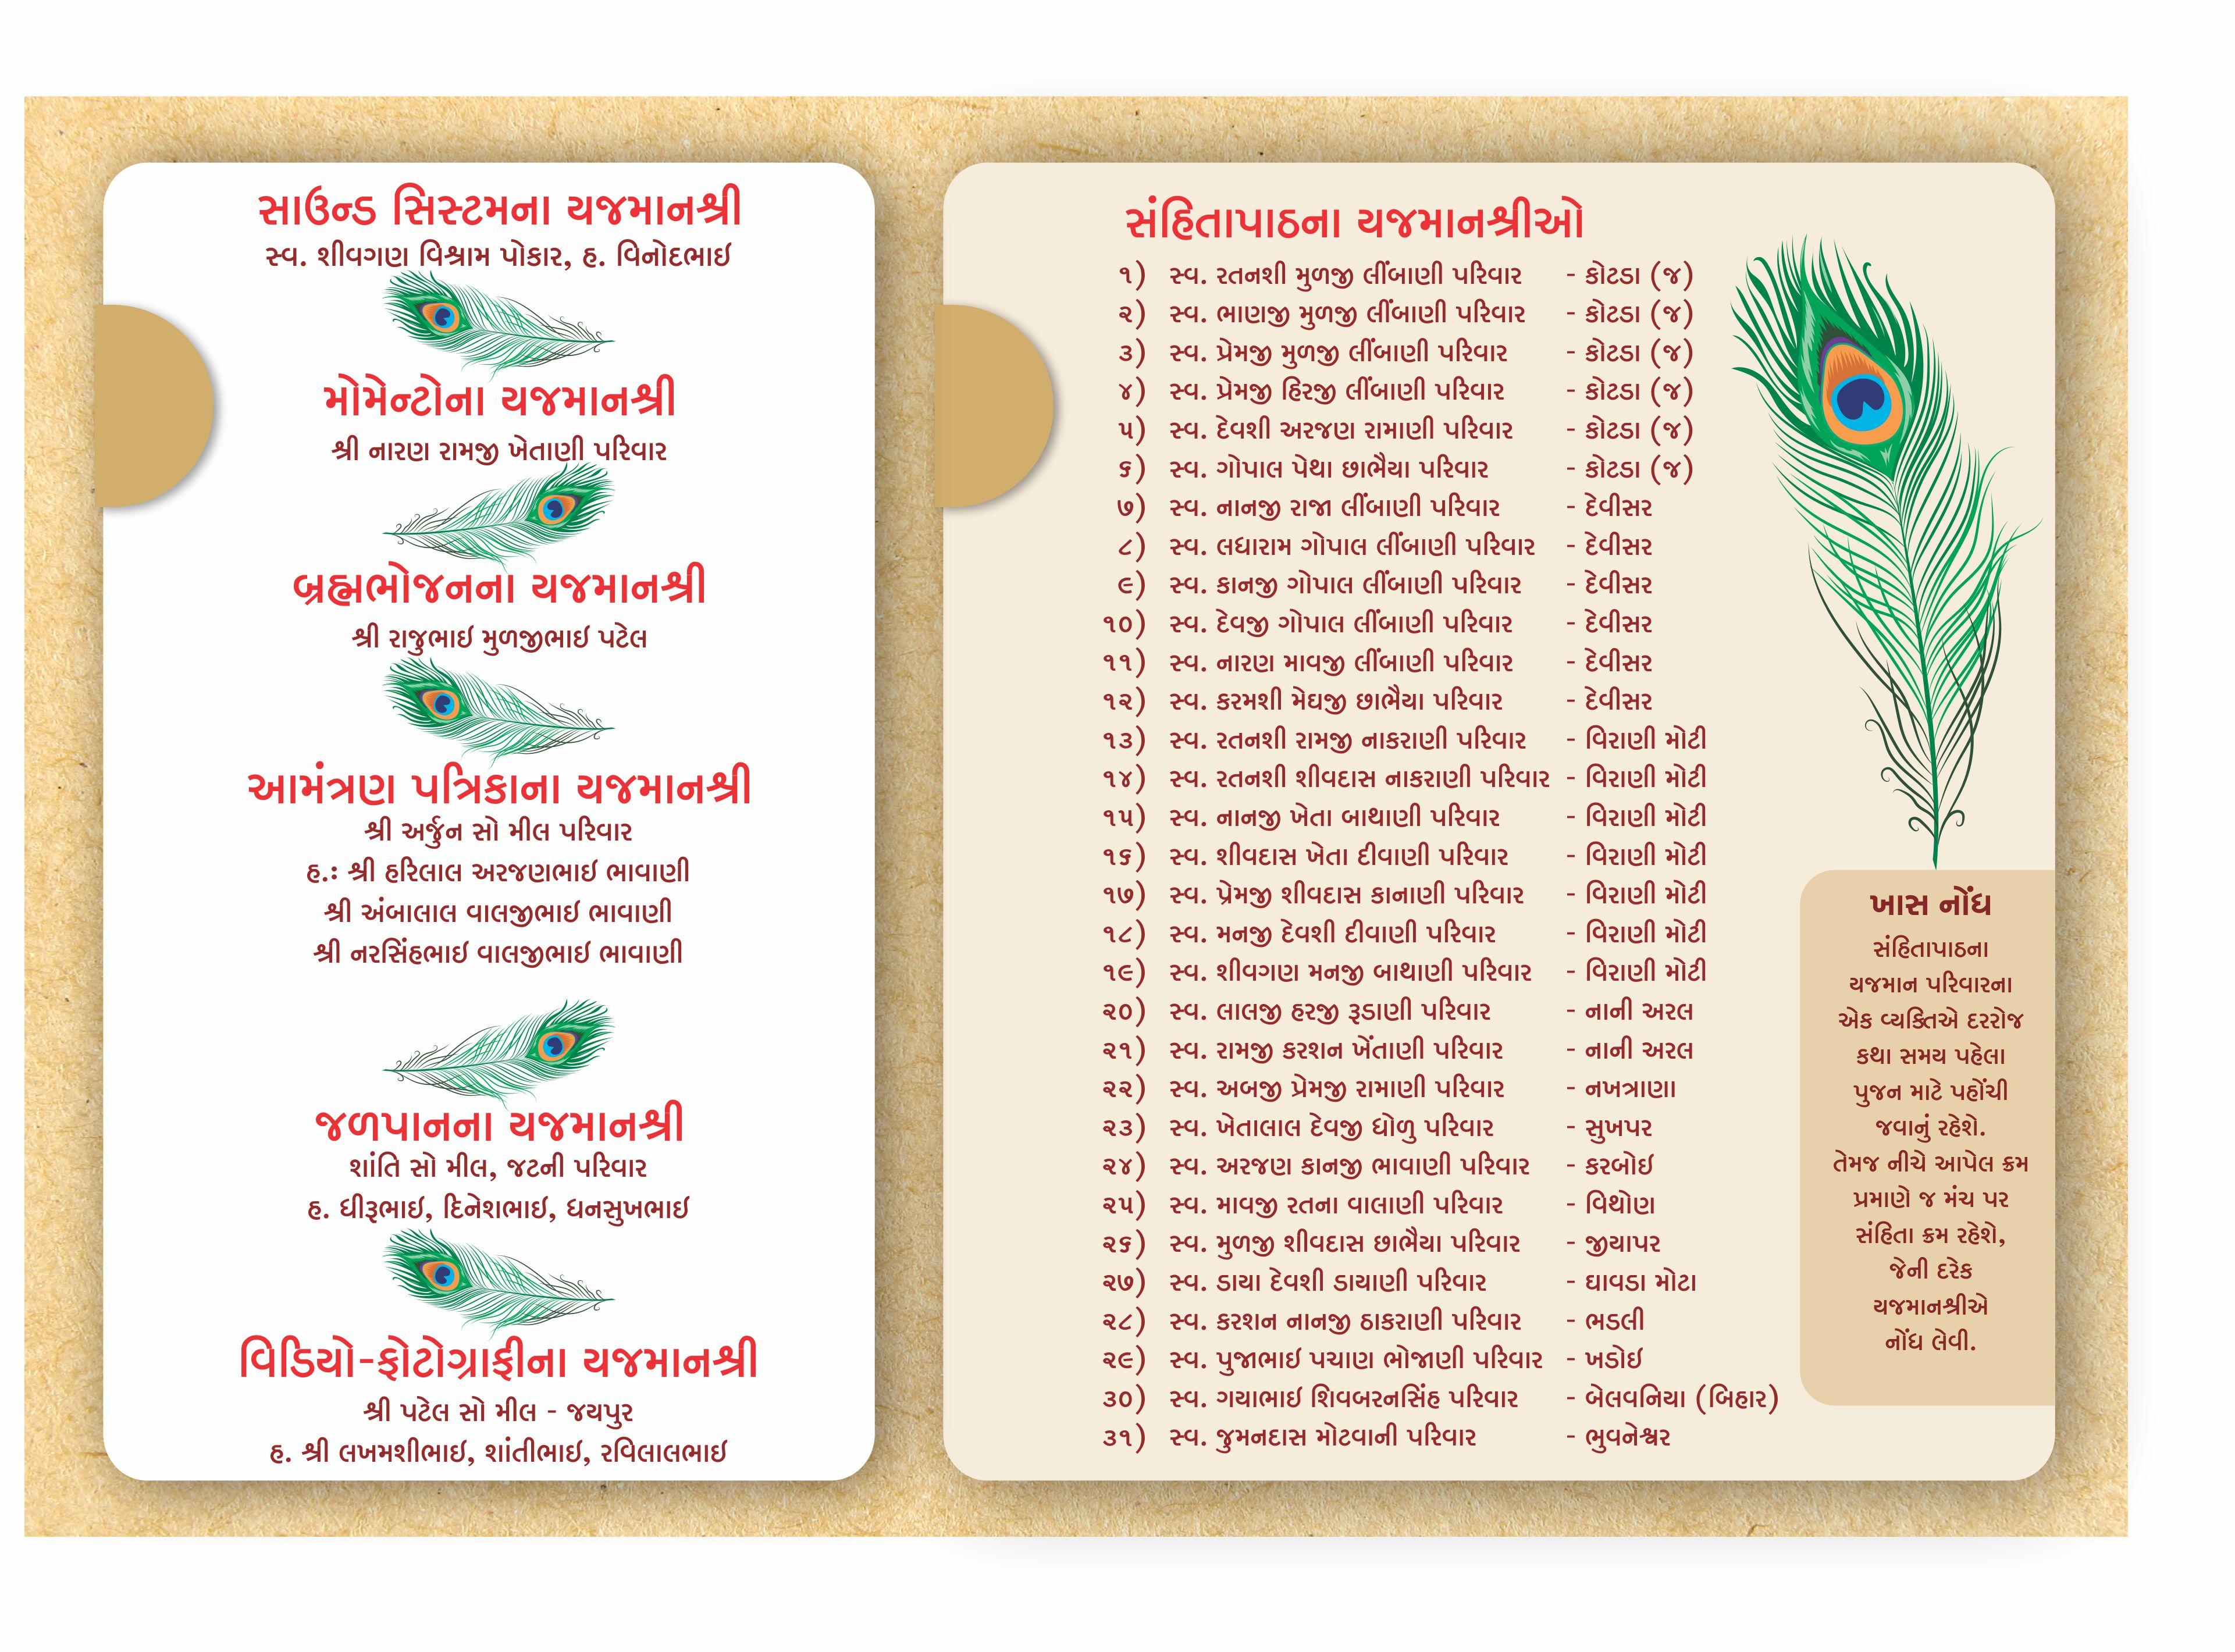 Bhubaneswar (Odisha)  Shrimad Bhagwat Saptah Mahotsav  14th to 20th Oct 2019